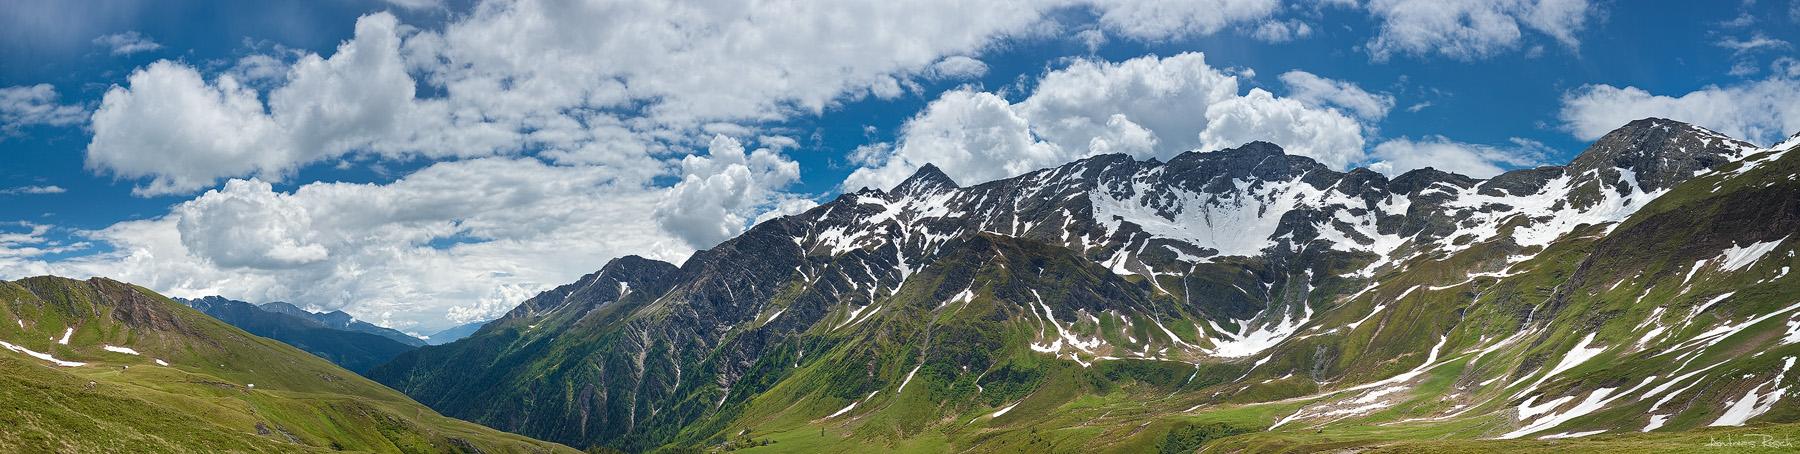 Jamnig - Panorama by AndreasResch